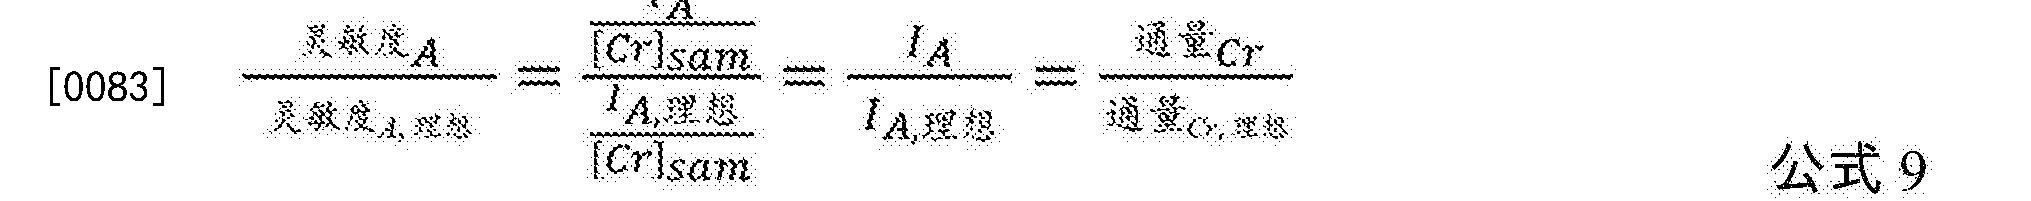 Figure CN107810409AD00095